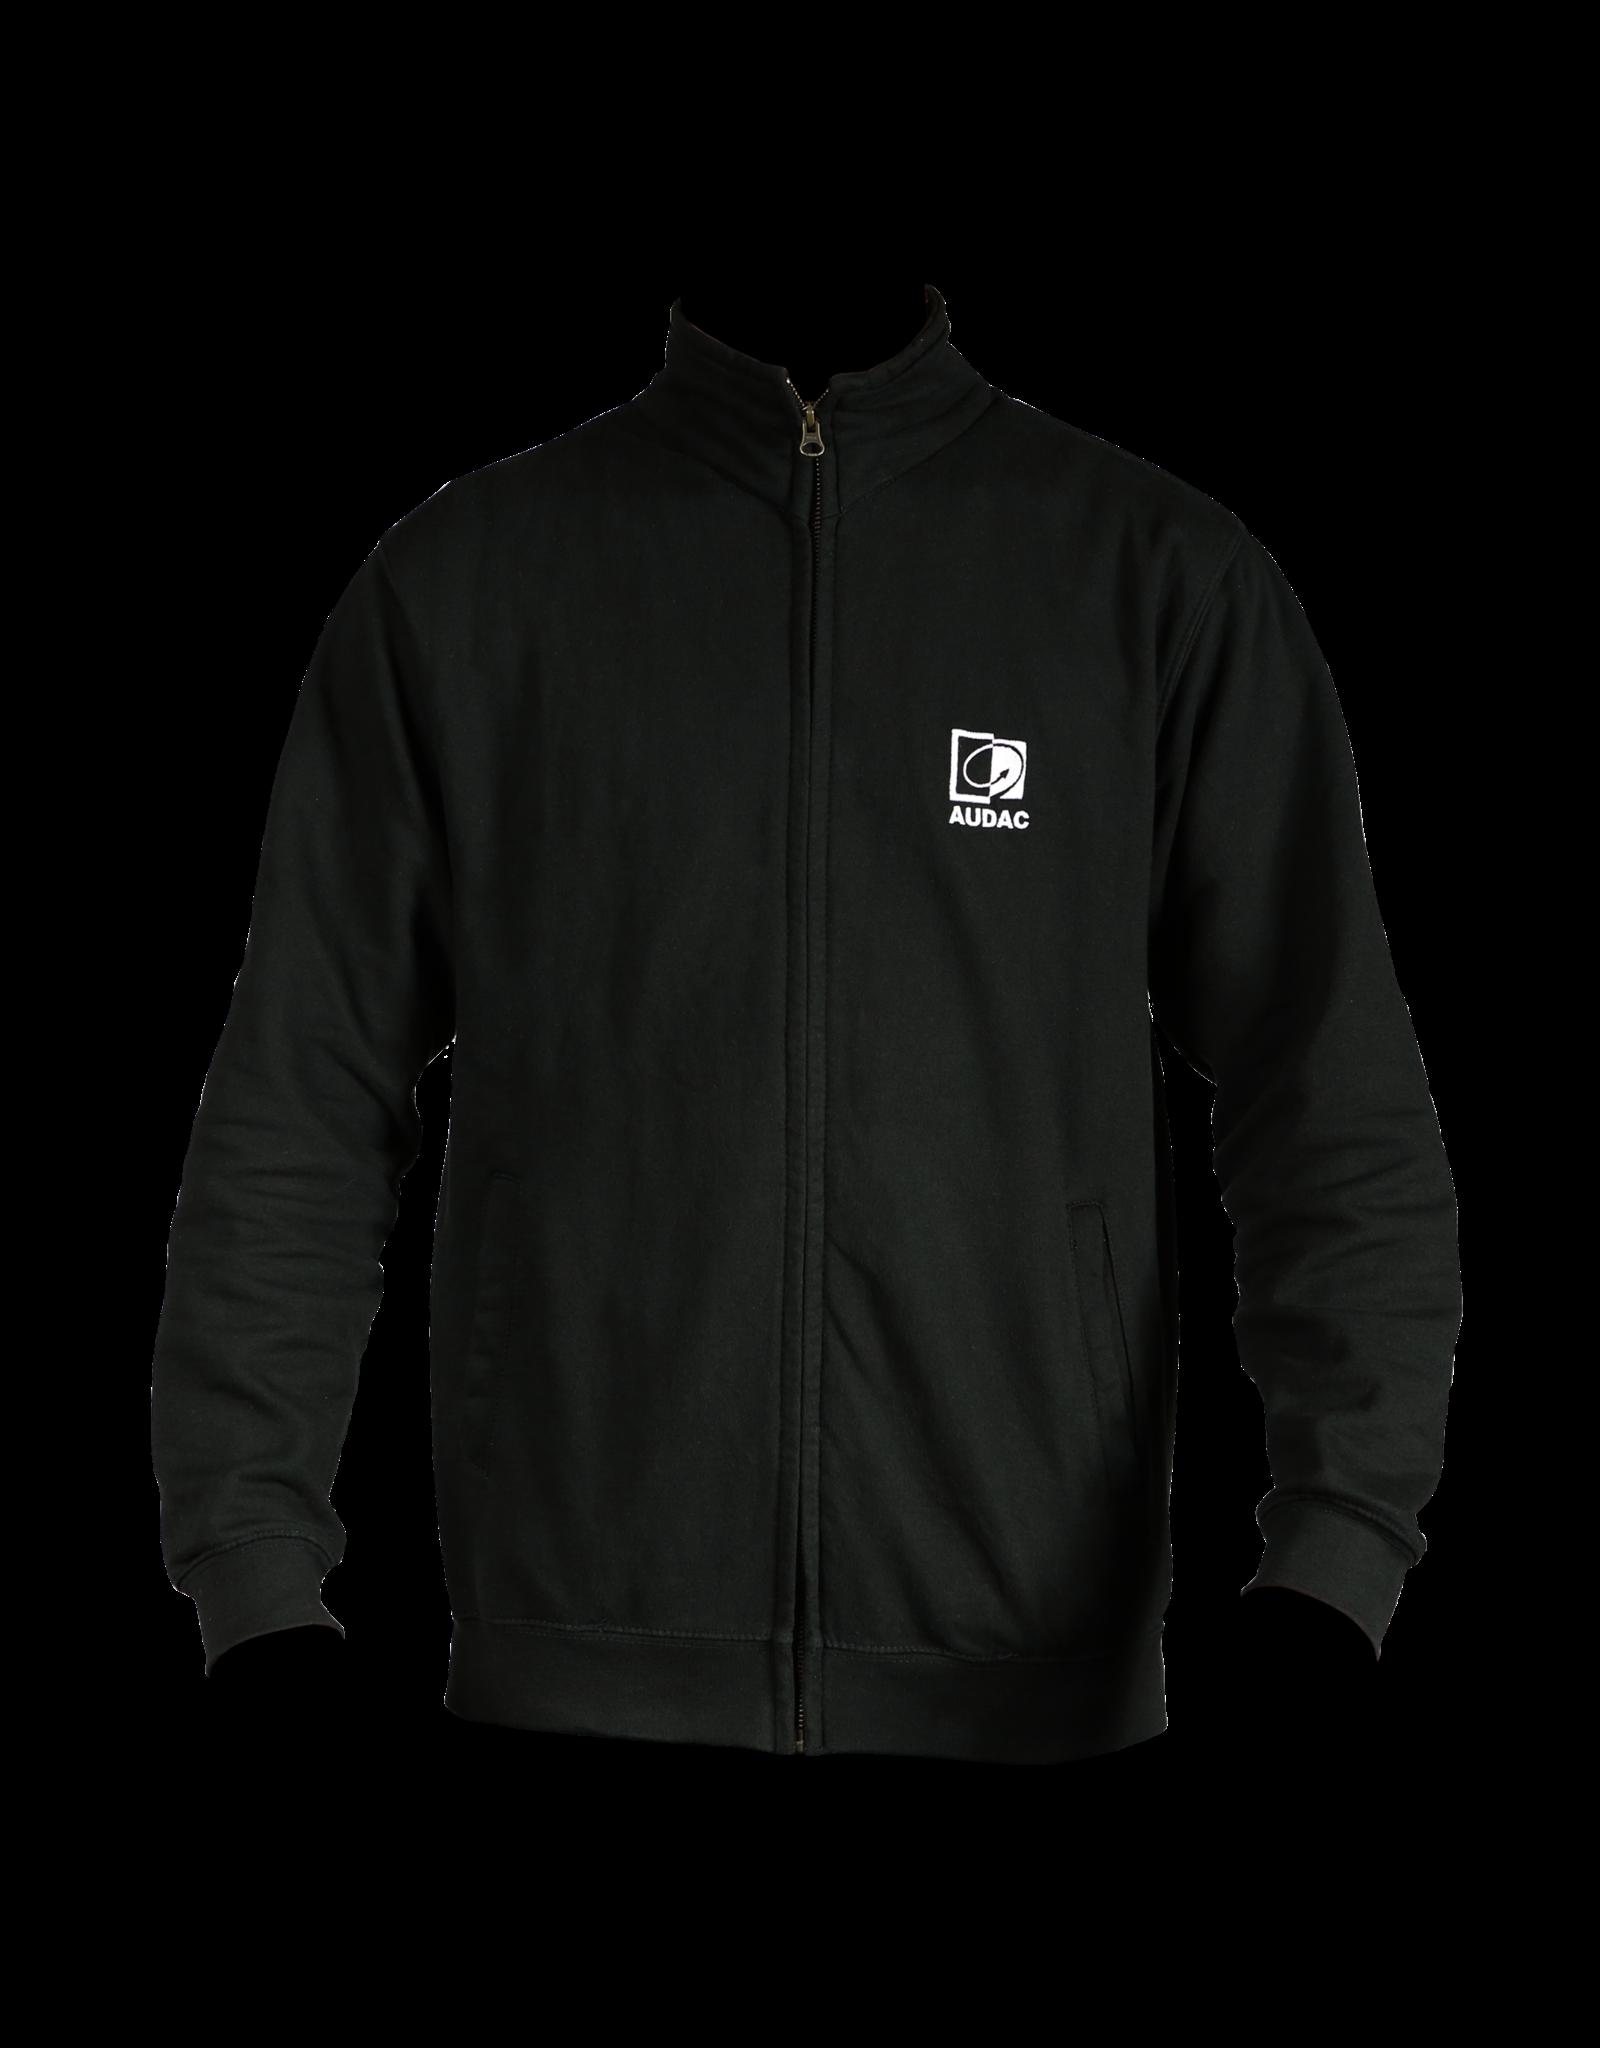 Audac AUDAC promotion sweater black MEDIUM